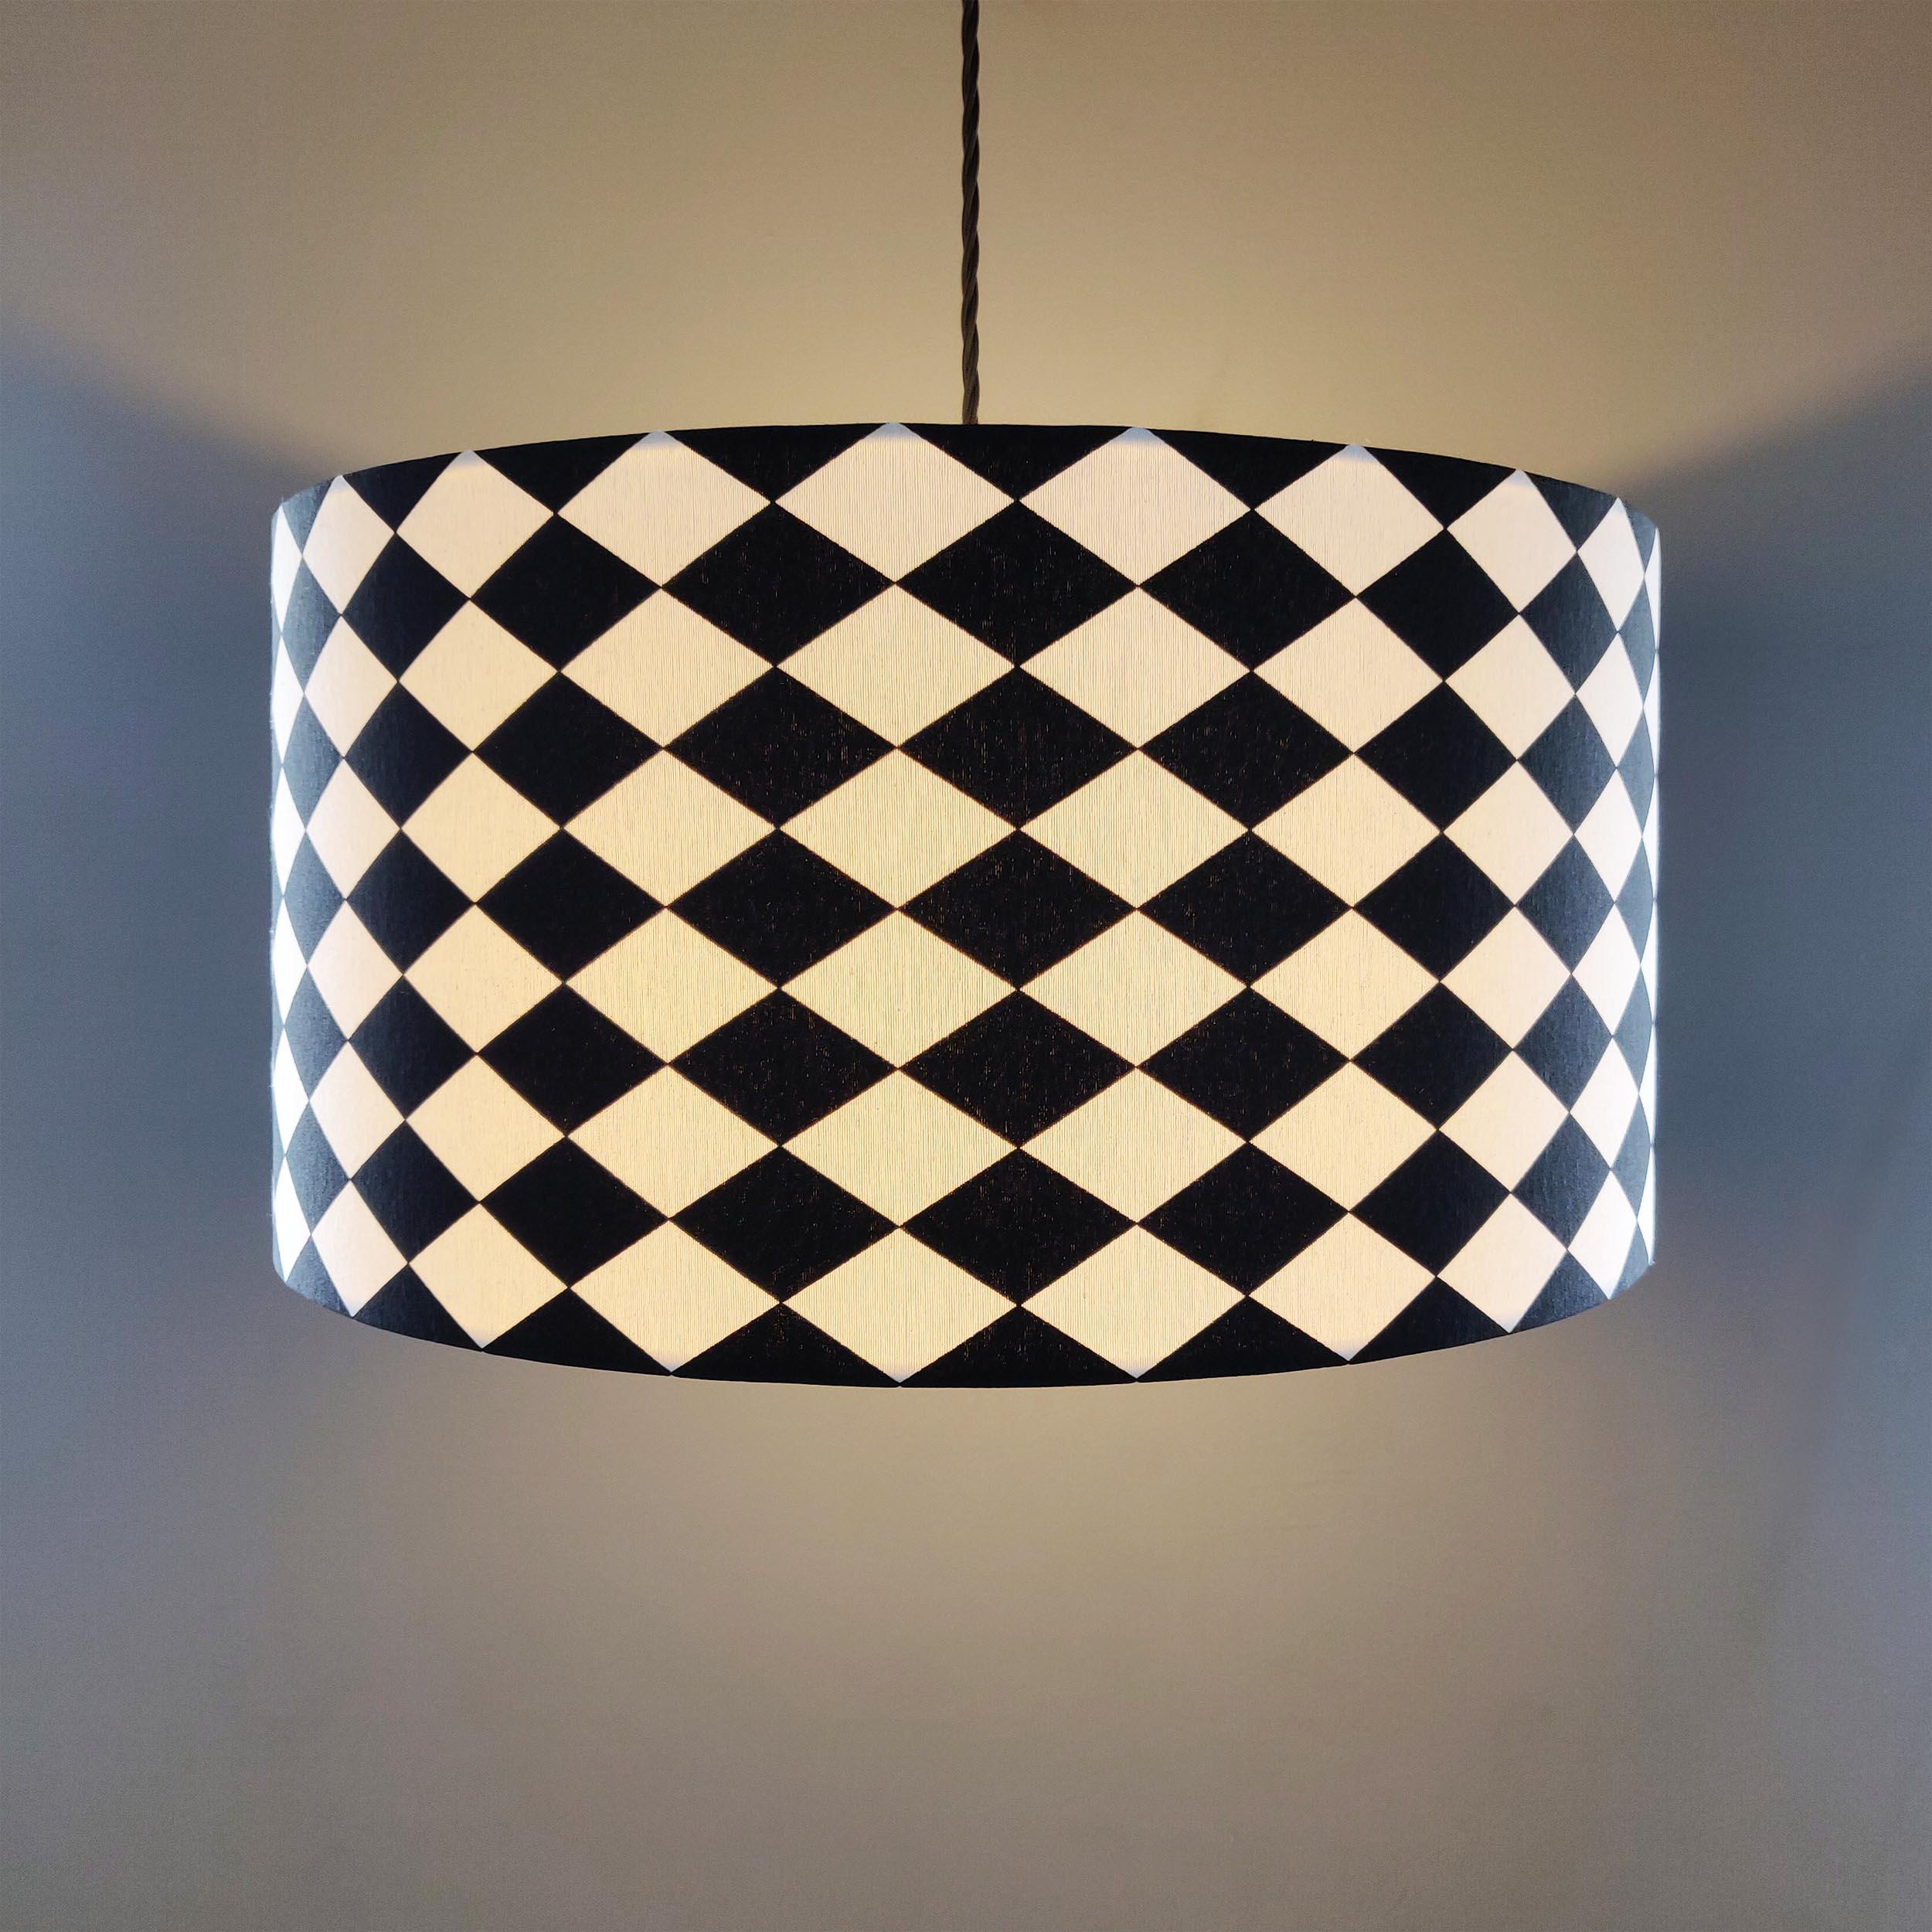 Black and White Geometric Hanging Lampshade